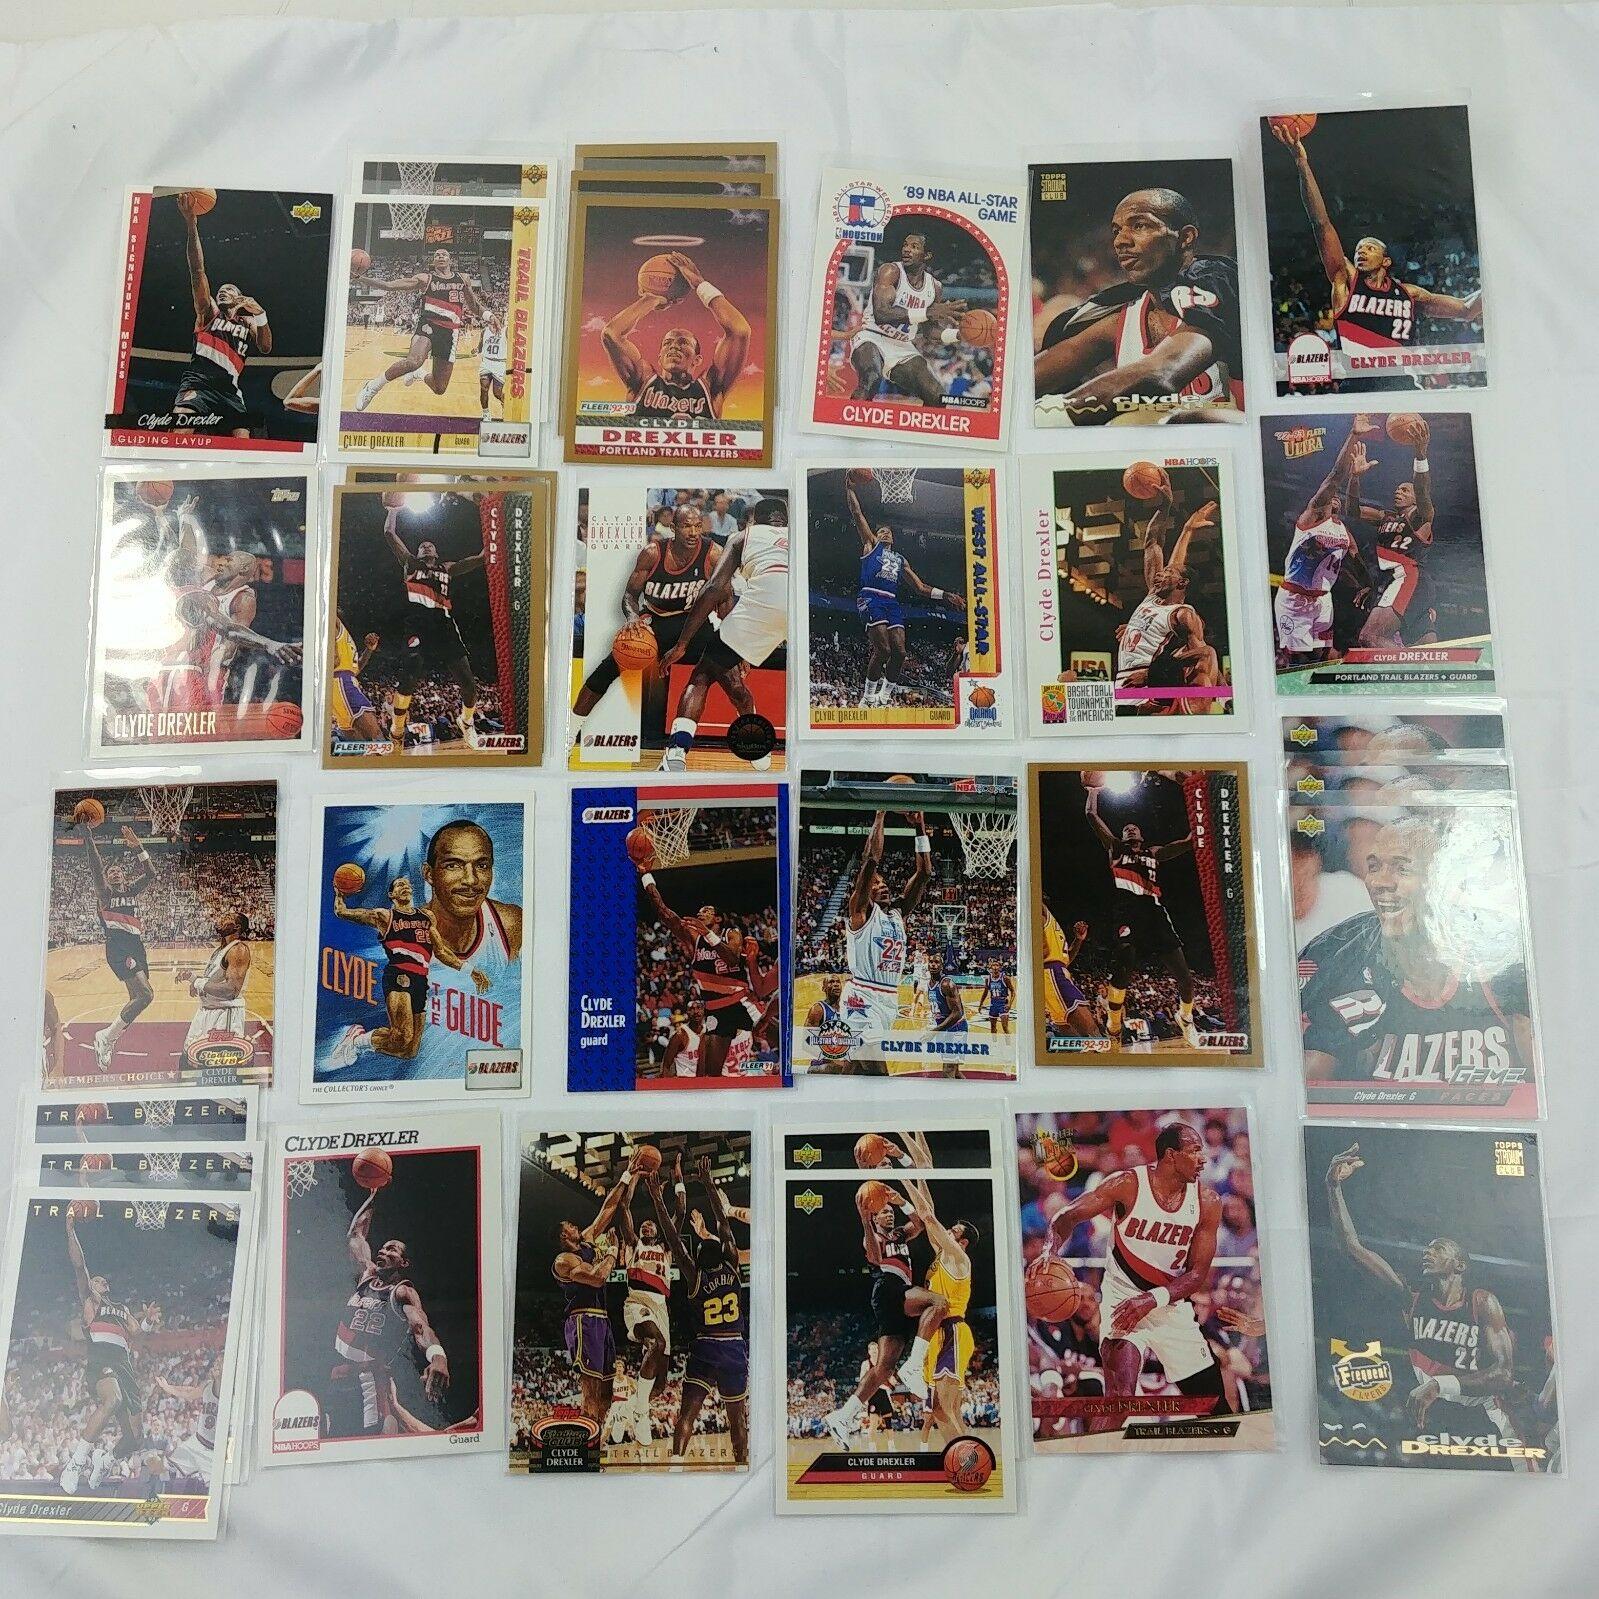 Portland Trail Blazers Nba: 32 Clyde Drexler Trading Cards Basketball Portland Trail